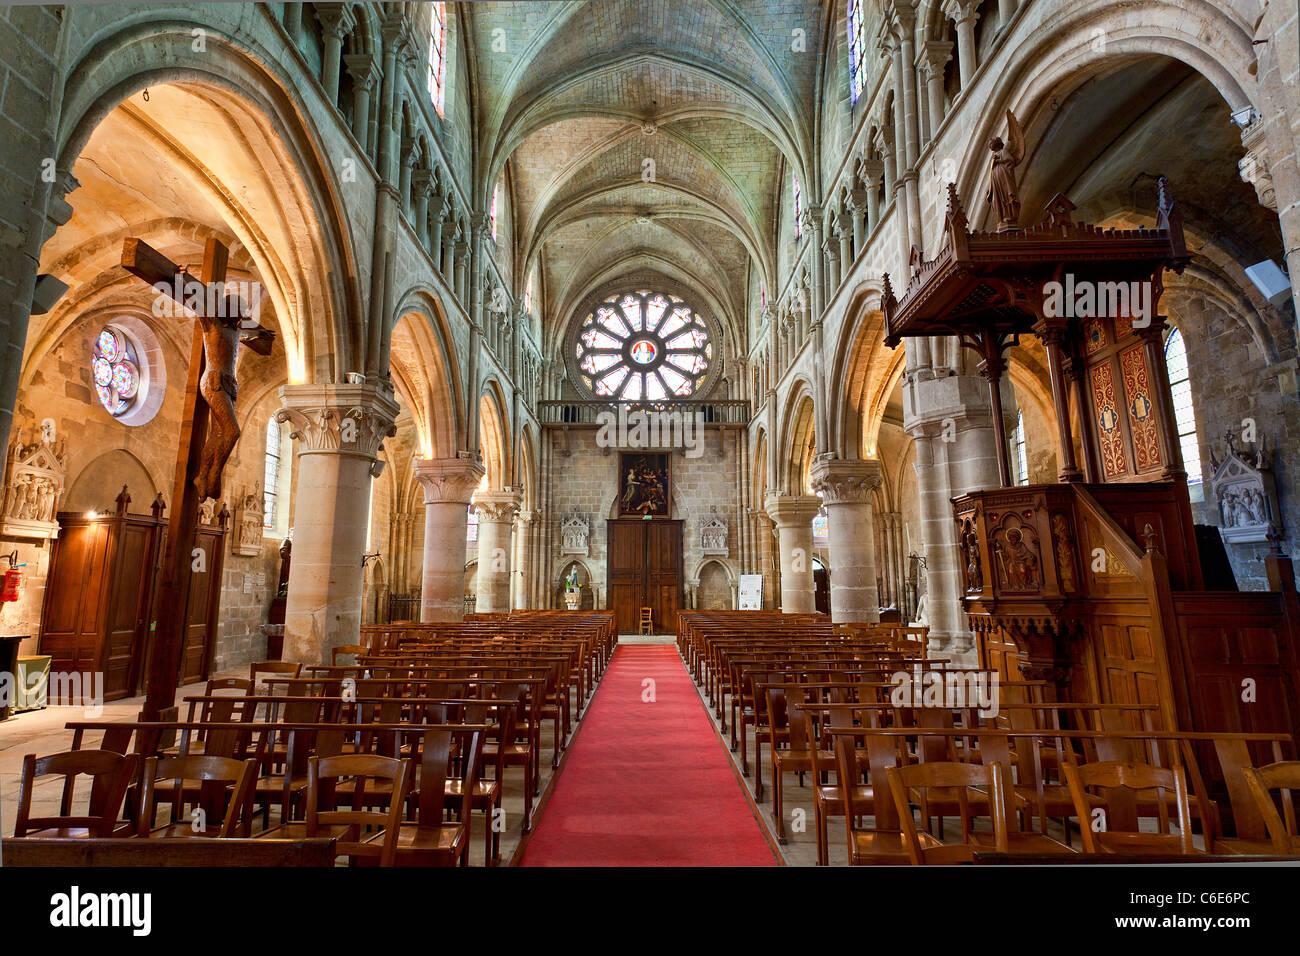 Europe, France, Val-d'oise (95), Auvers-sur-Oise Church - Stock Image